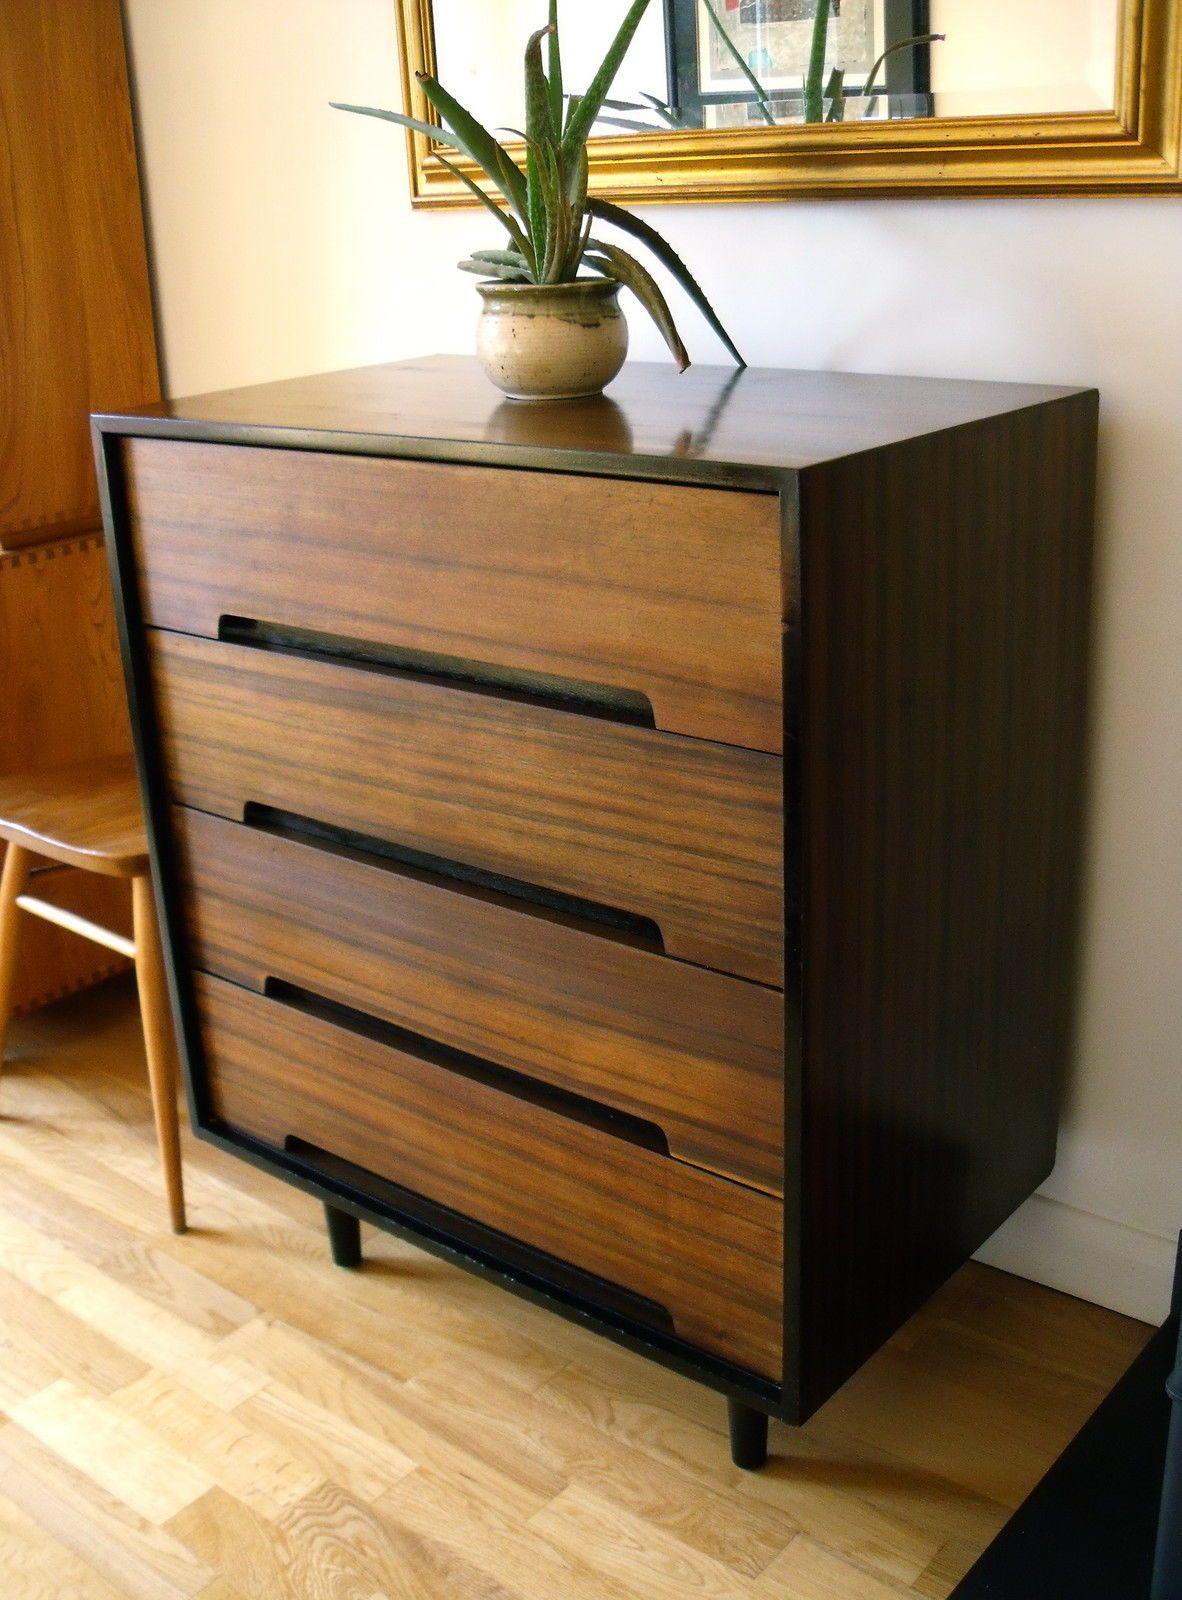 Light Walnut Bedroom Furniture Ethnicraft Light Frame Teak Chest Of Drawers Solid Wood